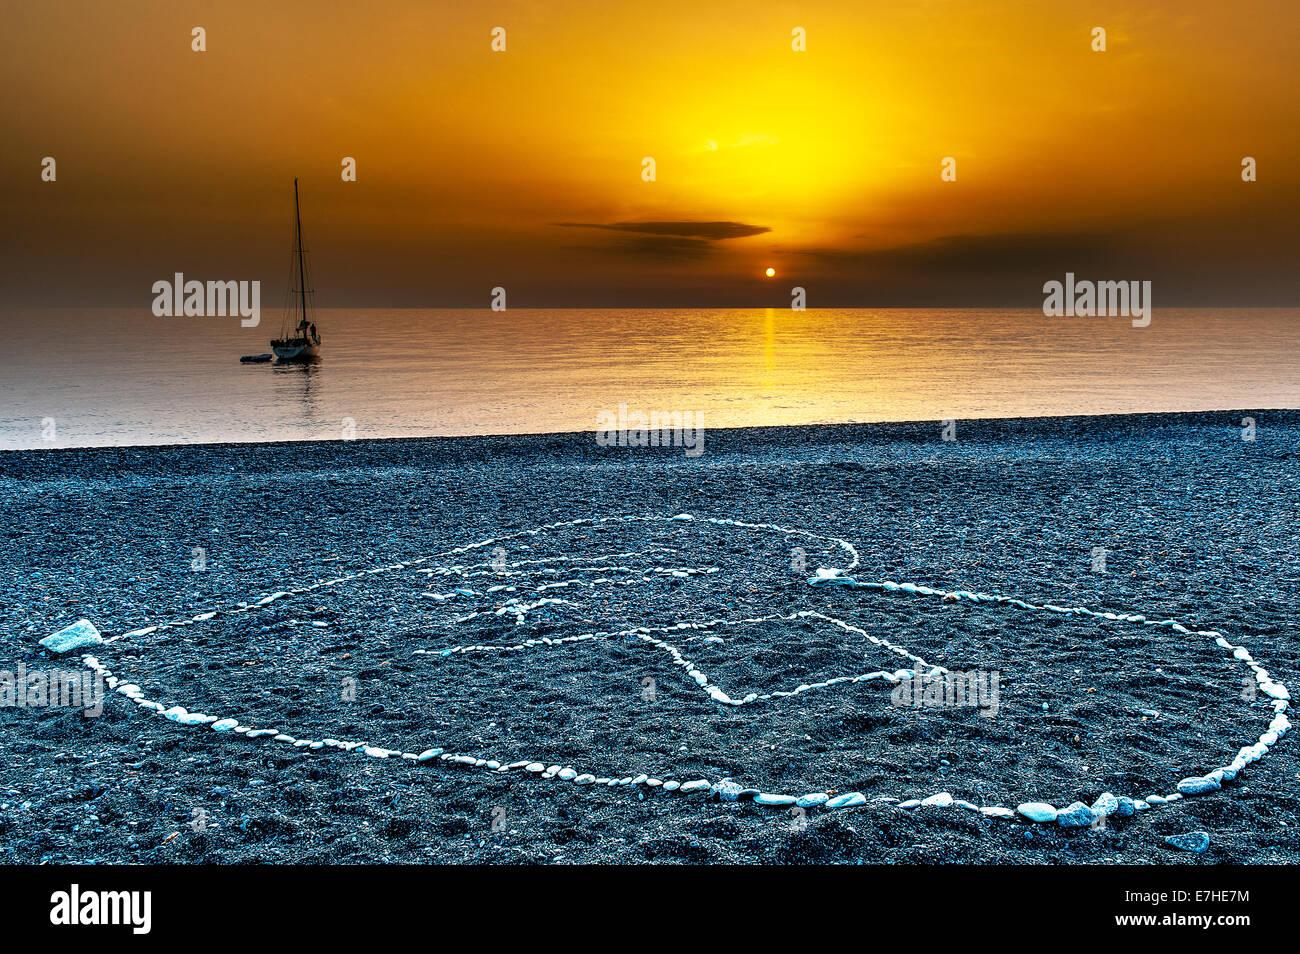 Europe, France, Corsica, Haute Corse, Cap Corse. Nonza. Drawing heart shape on the black pebble beach. - Stock Image